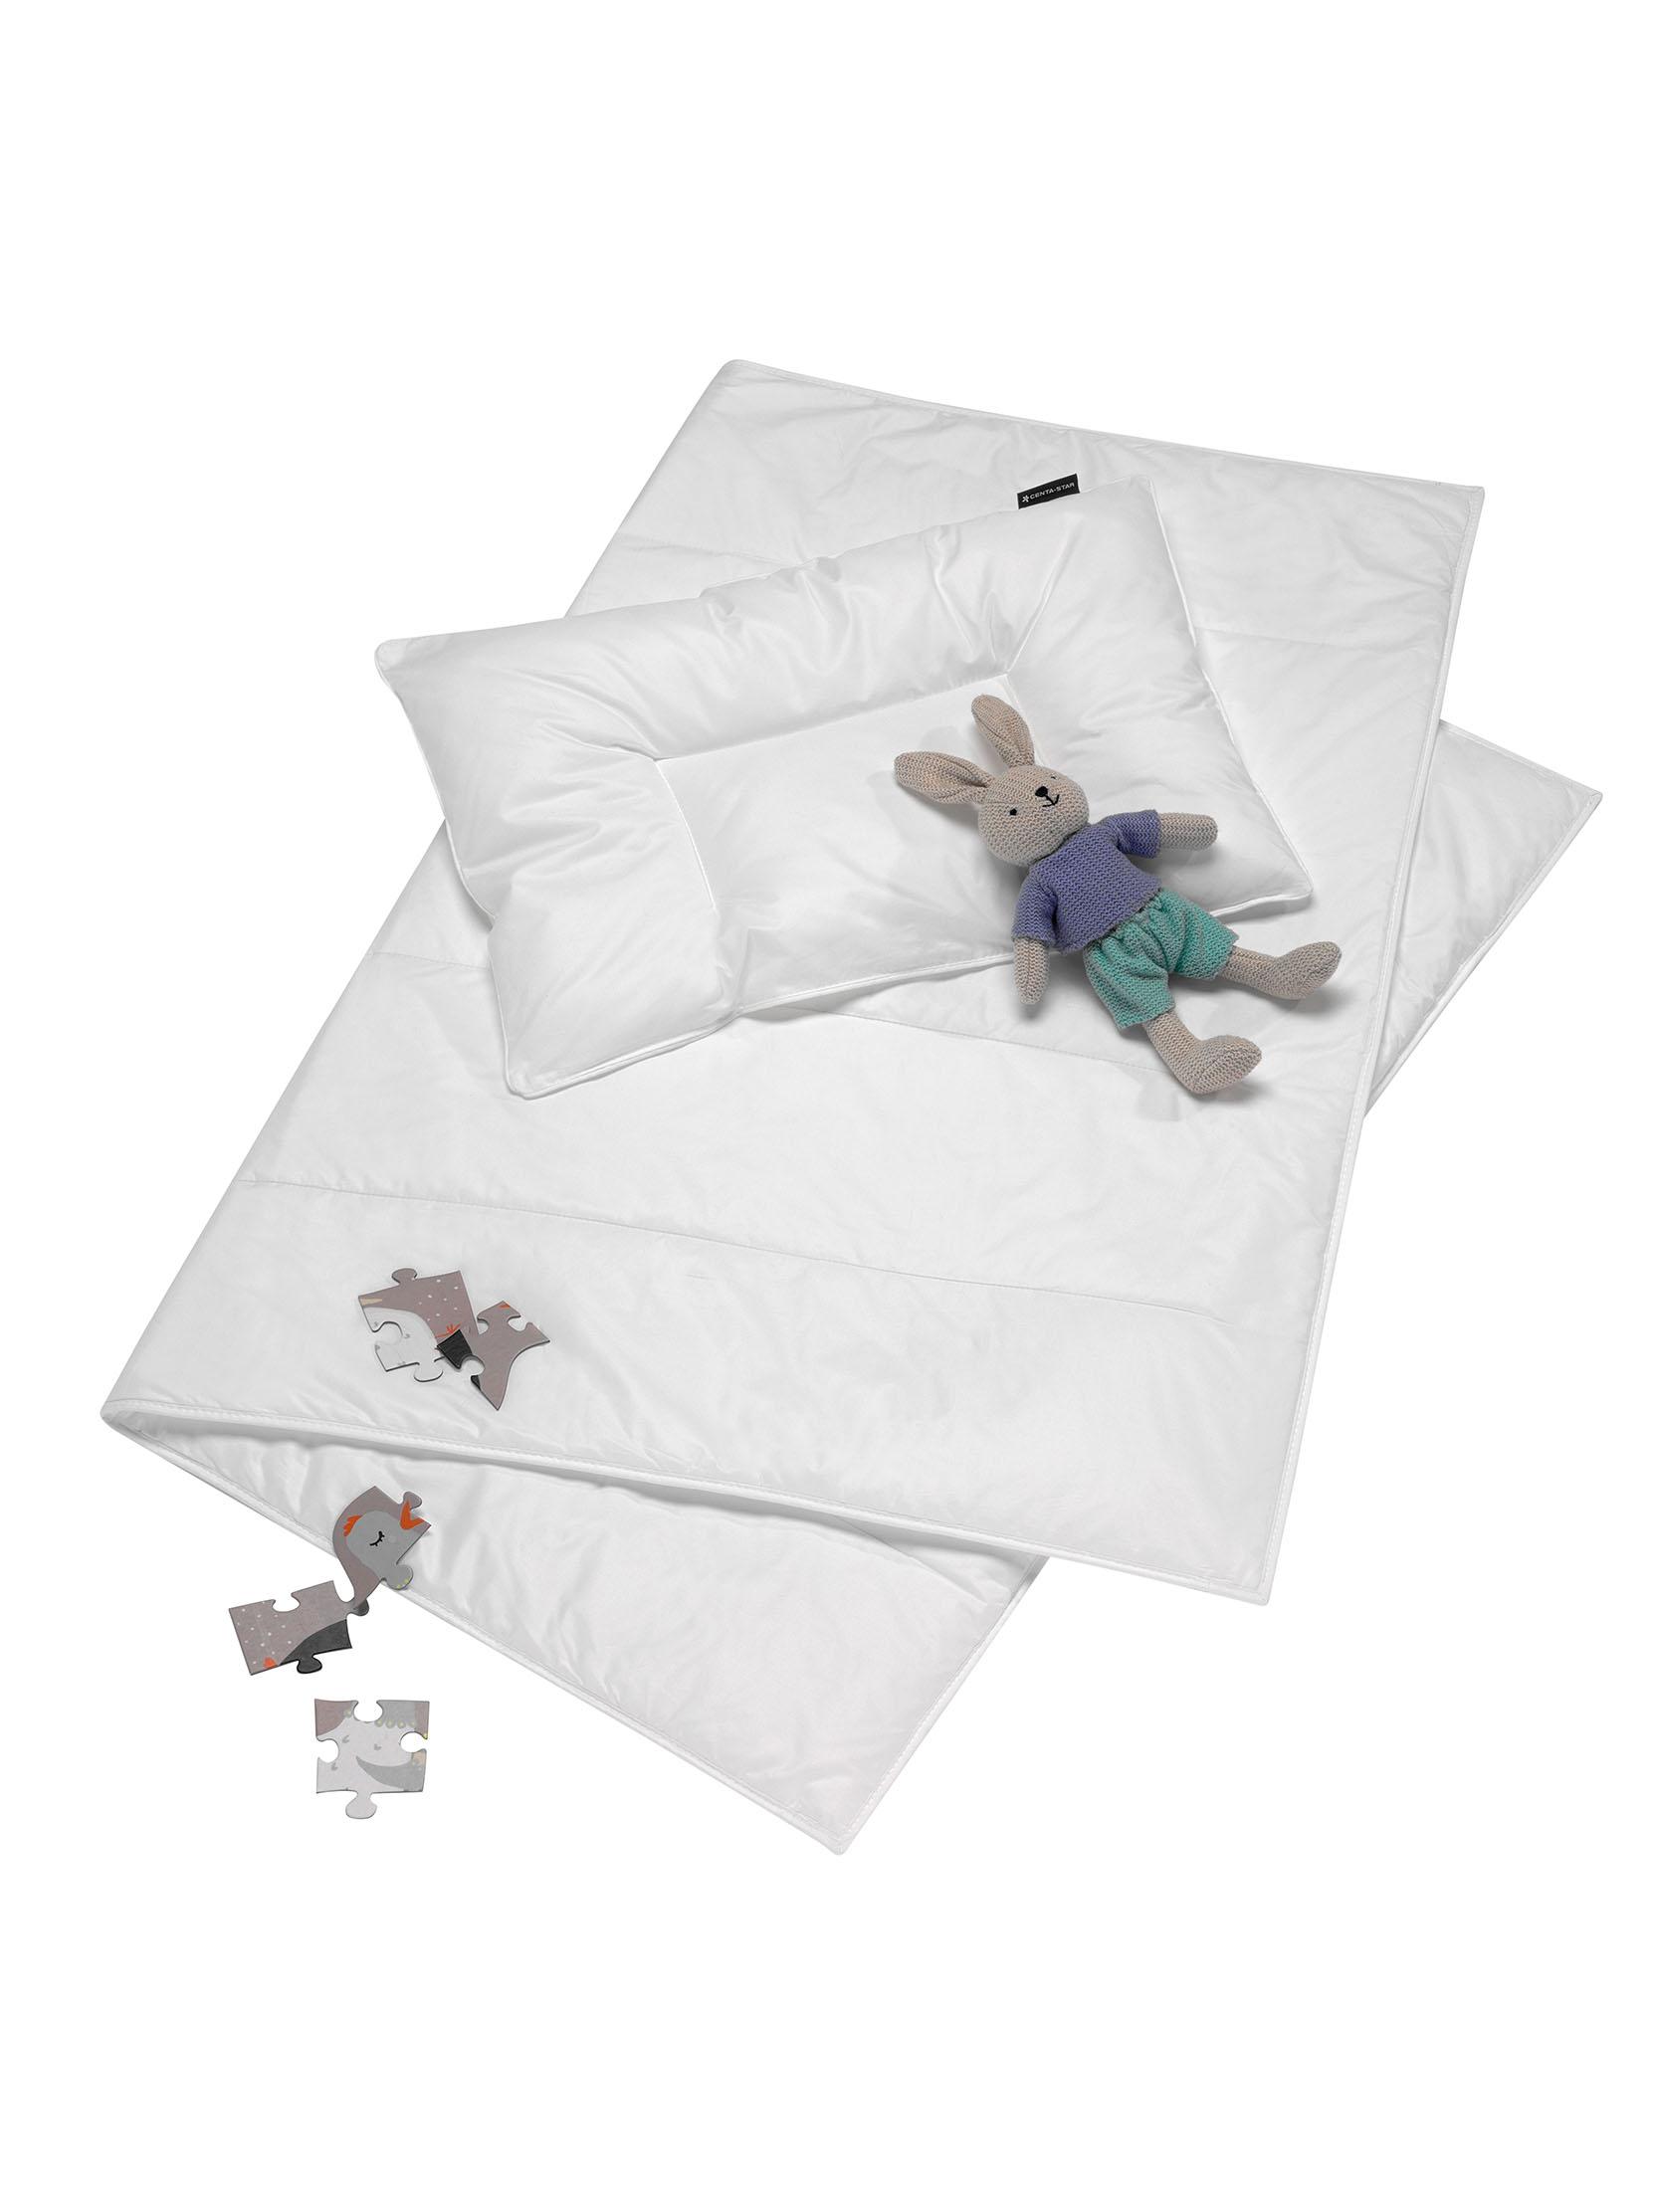 Centa Star Kinder Set Aqua-Aktiv 100x135 cm und Flachkissen 40x60 cm